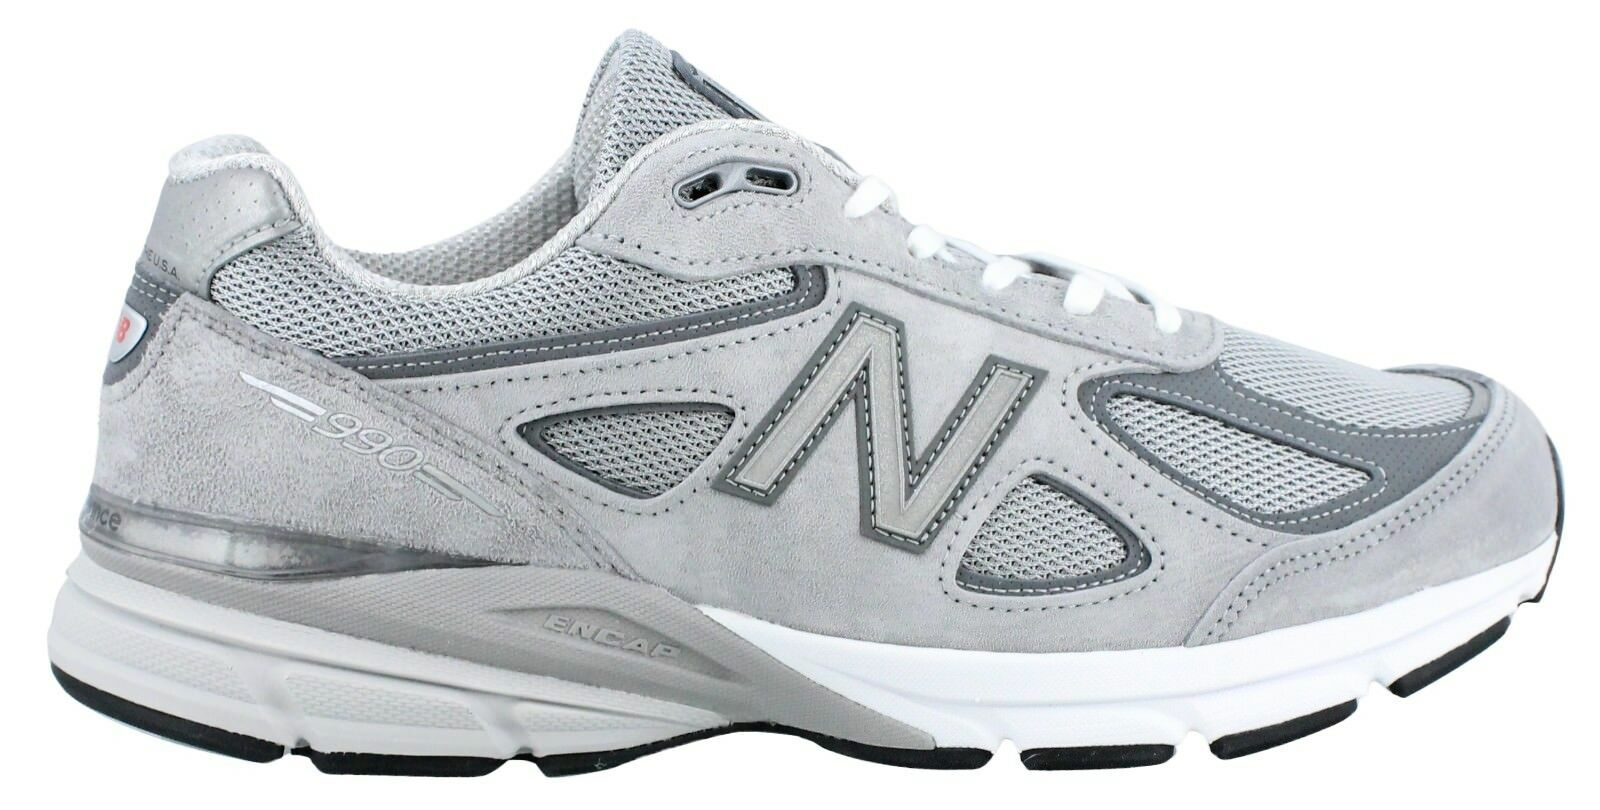 New Balance Men's M990GL4 Running Shoe in D - 2E and 4E